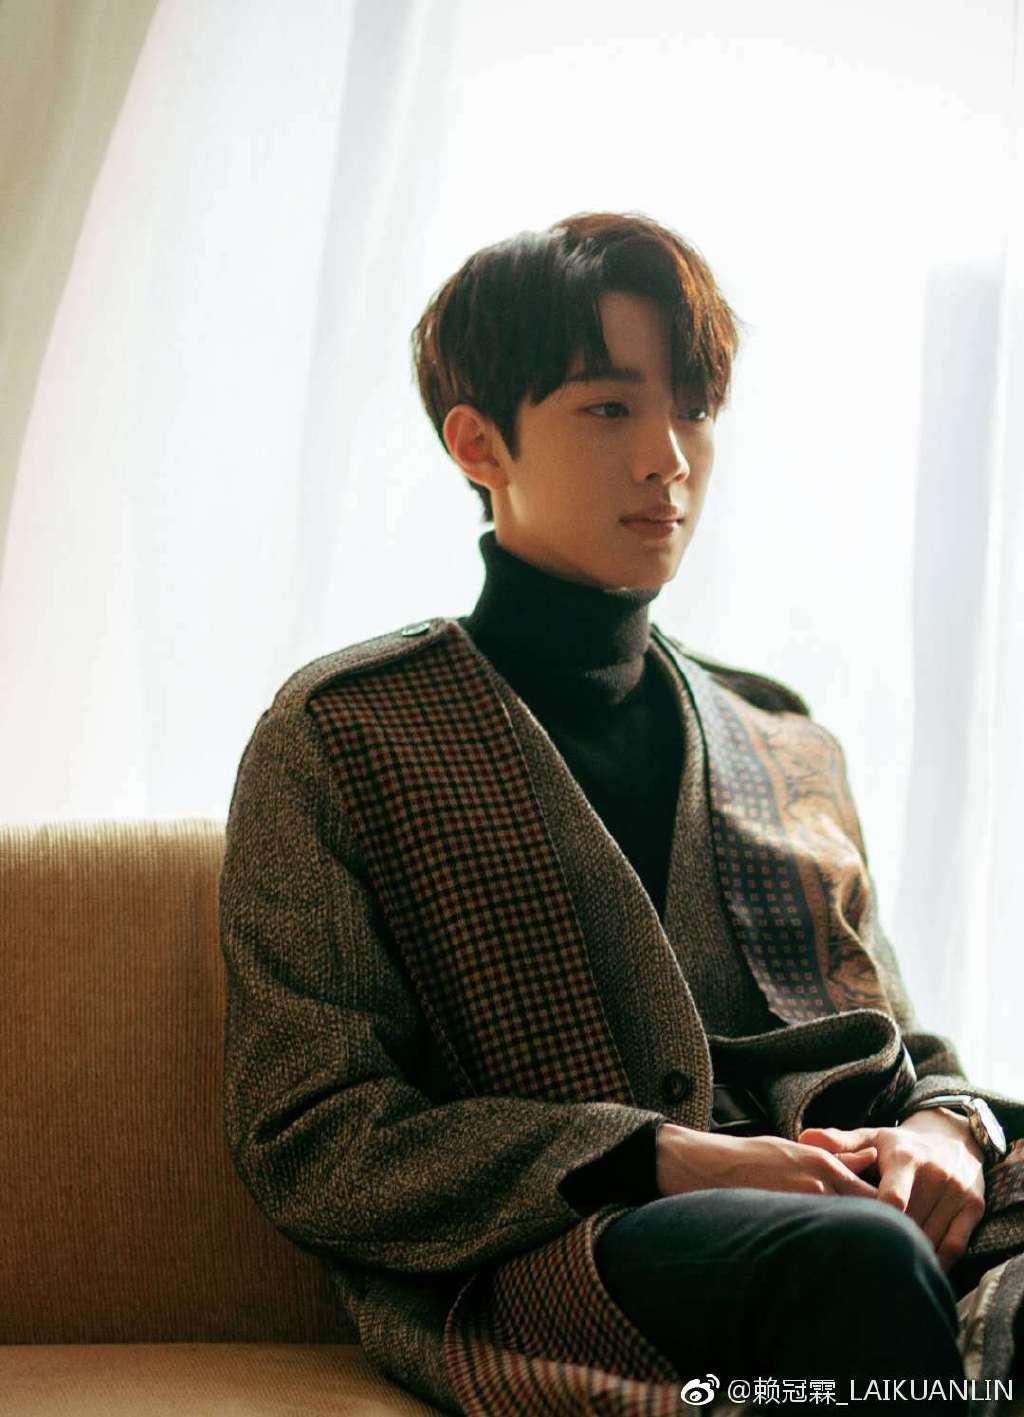 Mnet節目《PRODUCE 101 第二季》出道的限定男團Wanna One自從合約到期後,外界十分關注各自的發展,現在幾乎11位成員都公開未來動向,其中來自台灣的成員賴冠霖賴冠霖確定會在韓、中兩地進行演藝活動